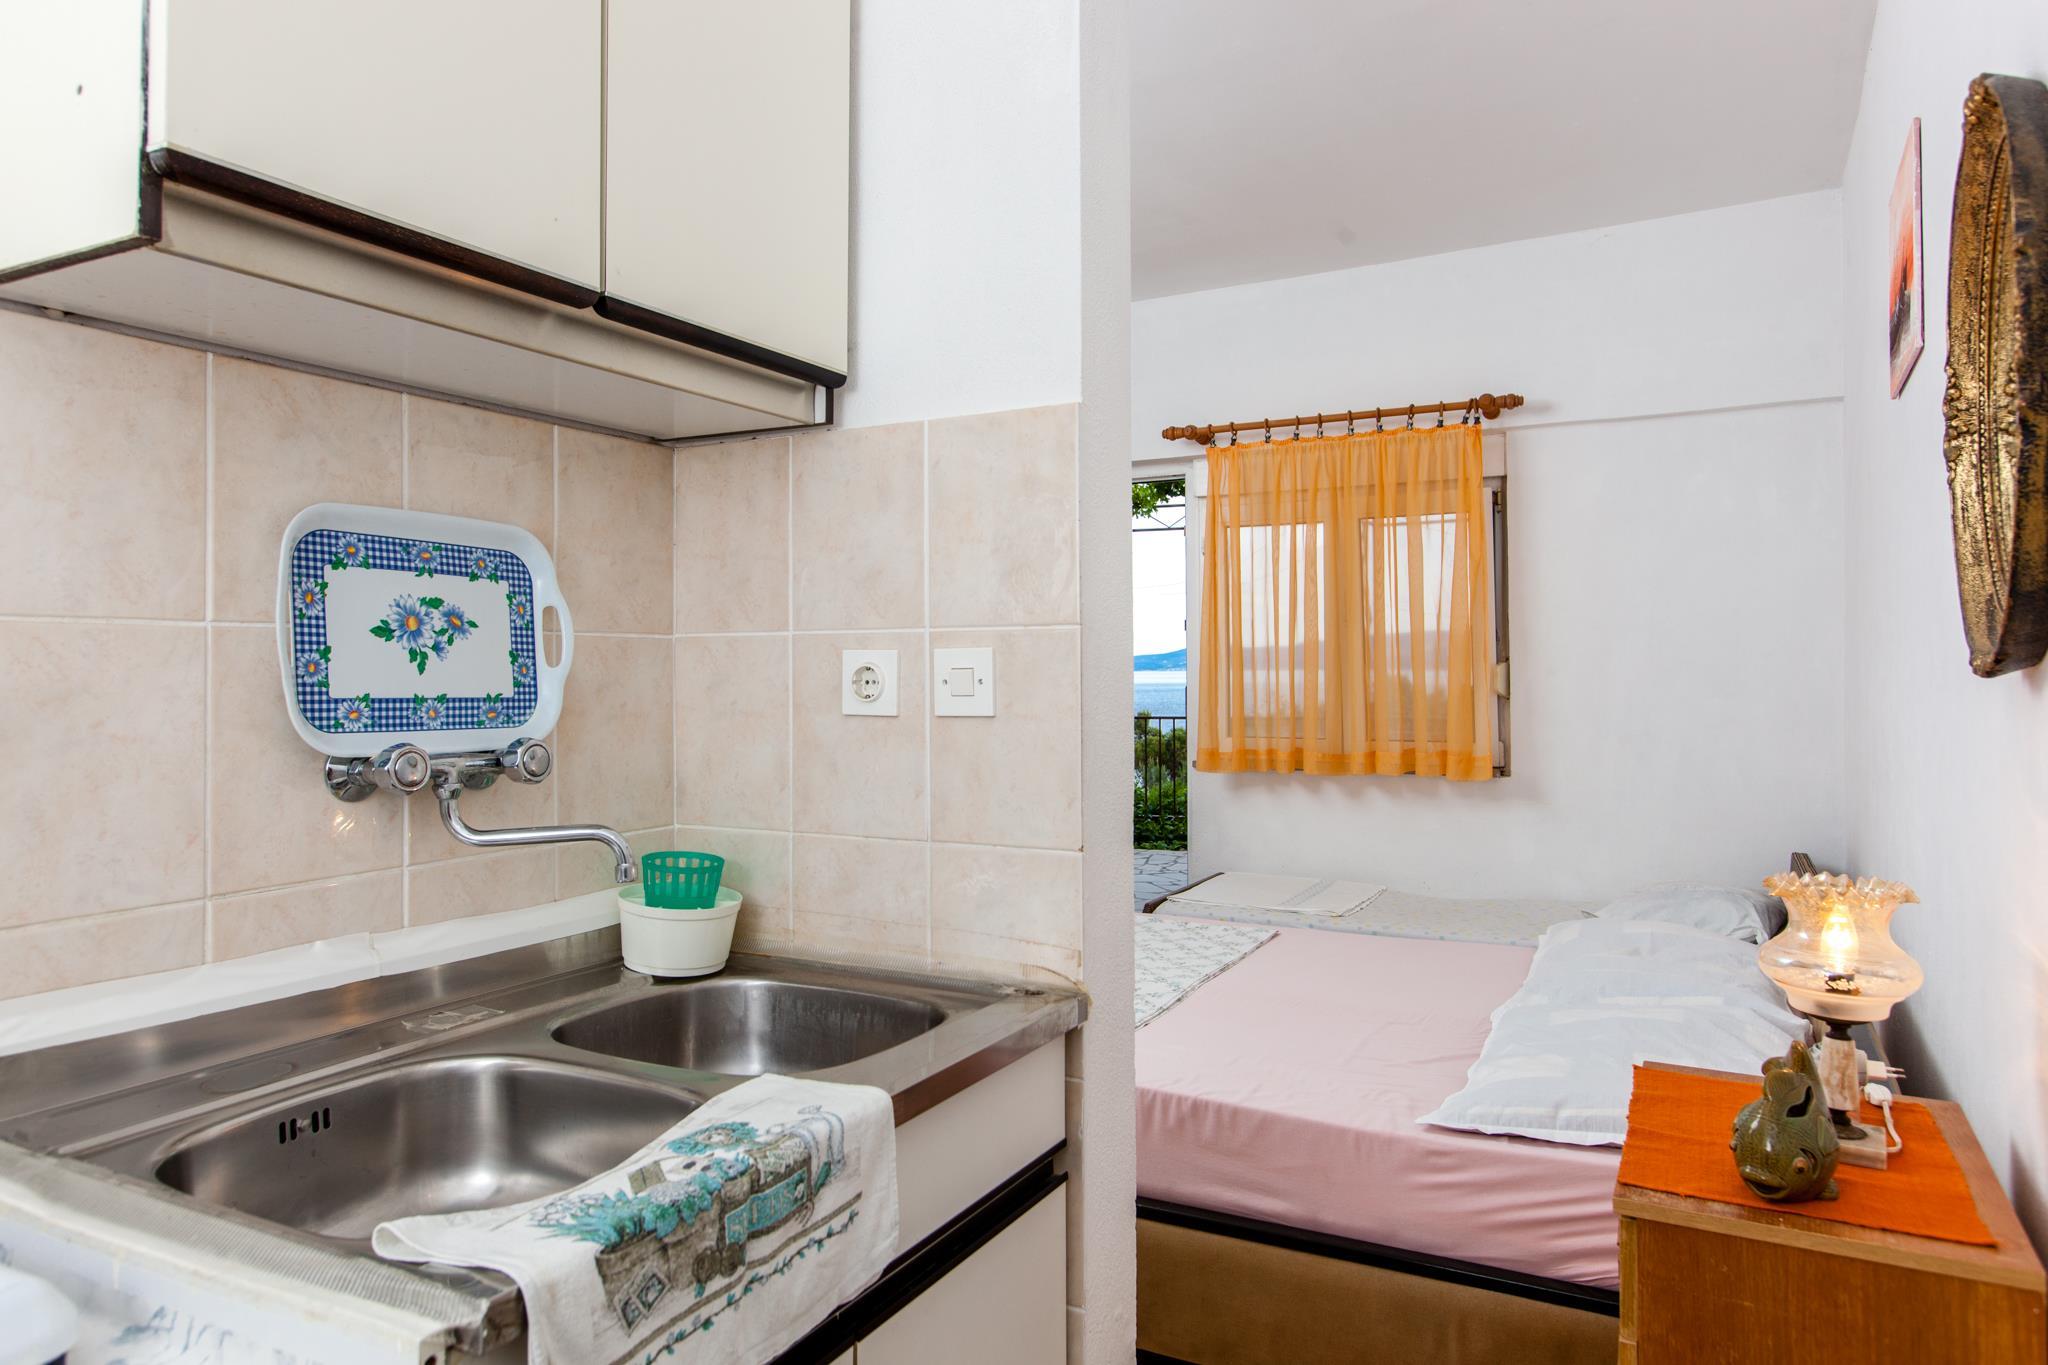 Ferienwohnung Apartments Bla~enka / A3 / One Bedroom (1928327), Lokva Rogoznica, , Dalmatien, Kroatien, Bild 11